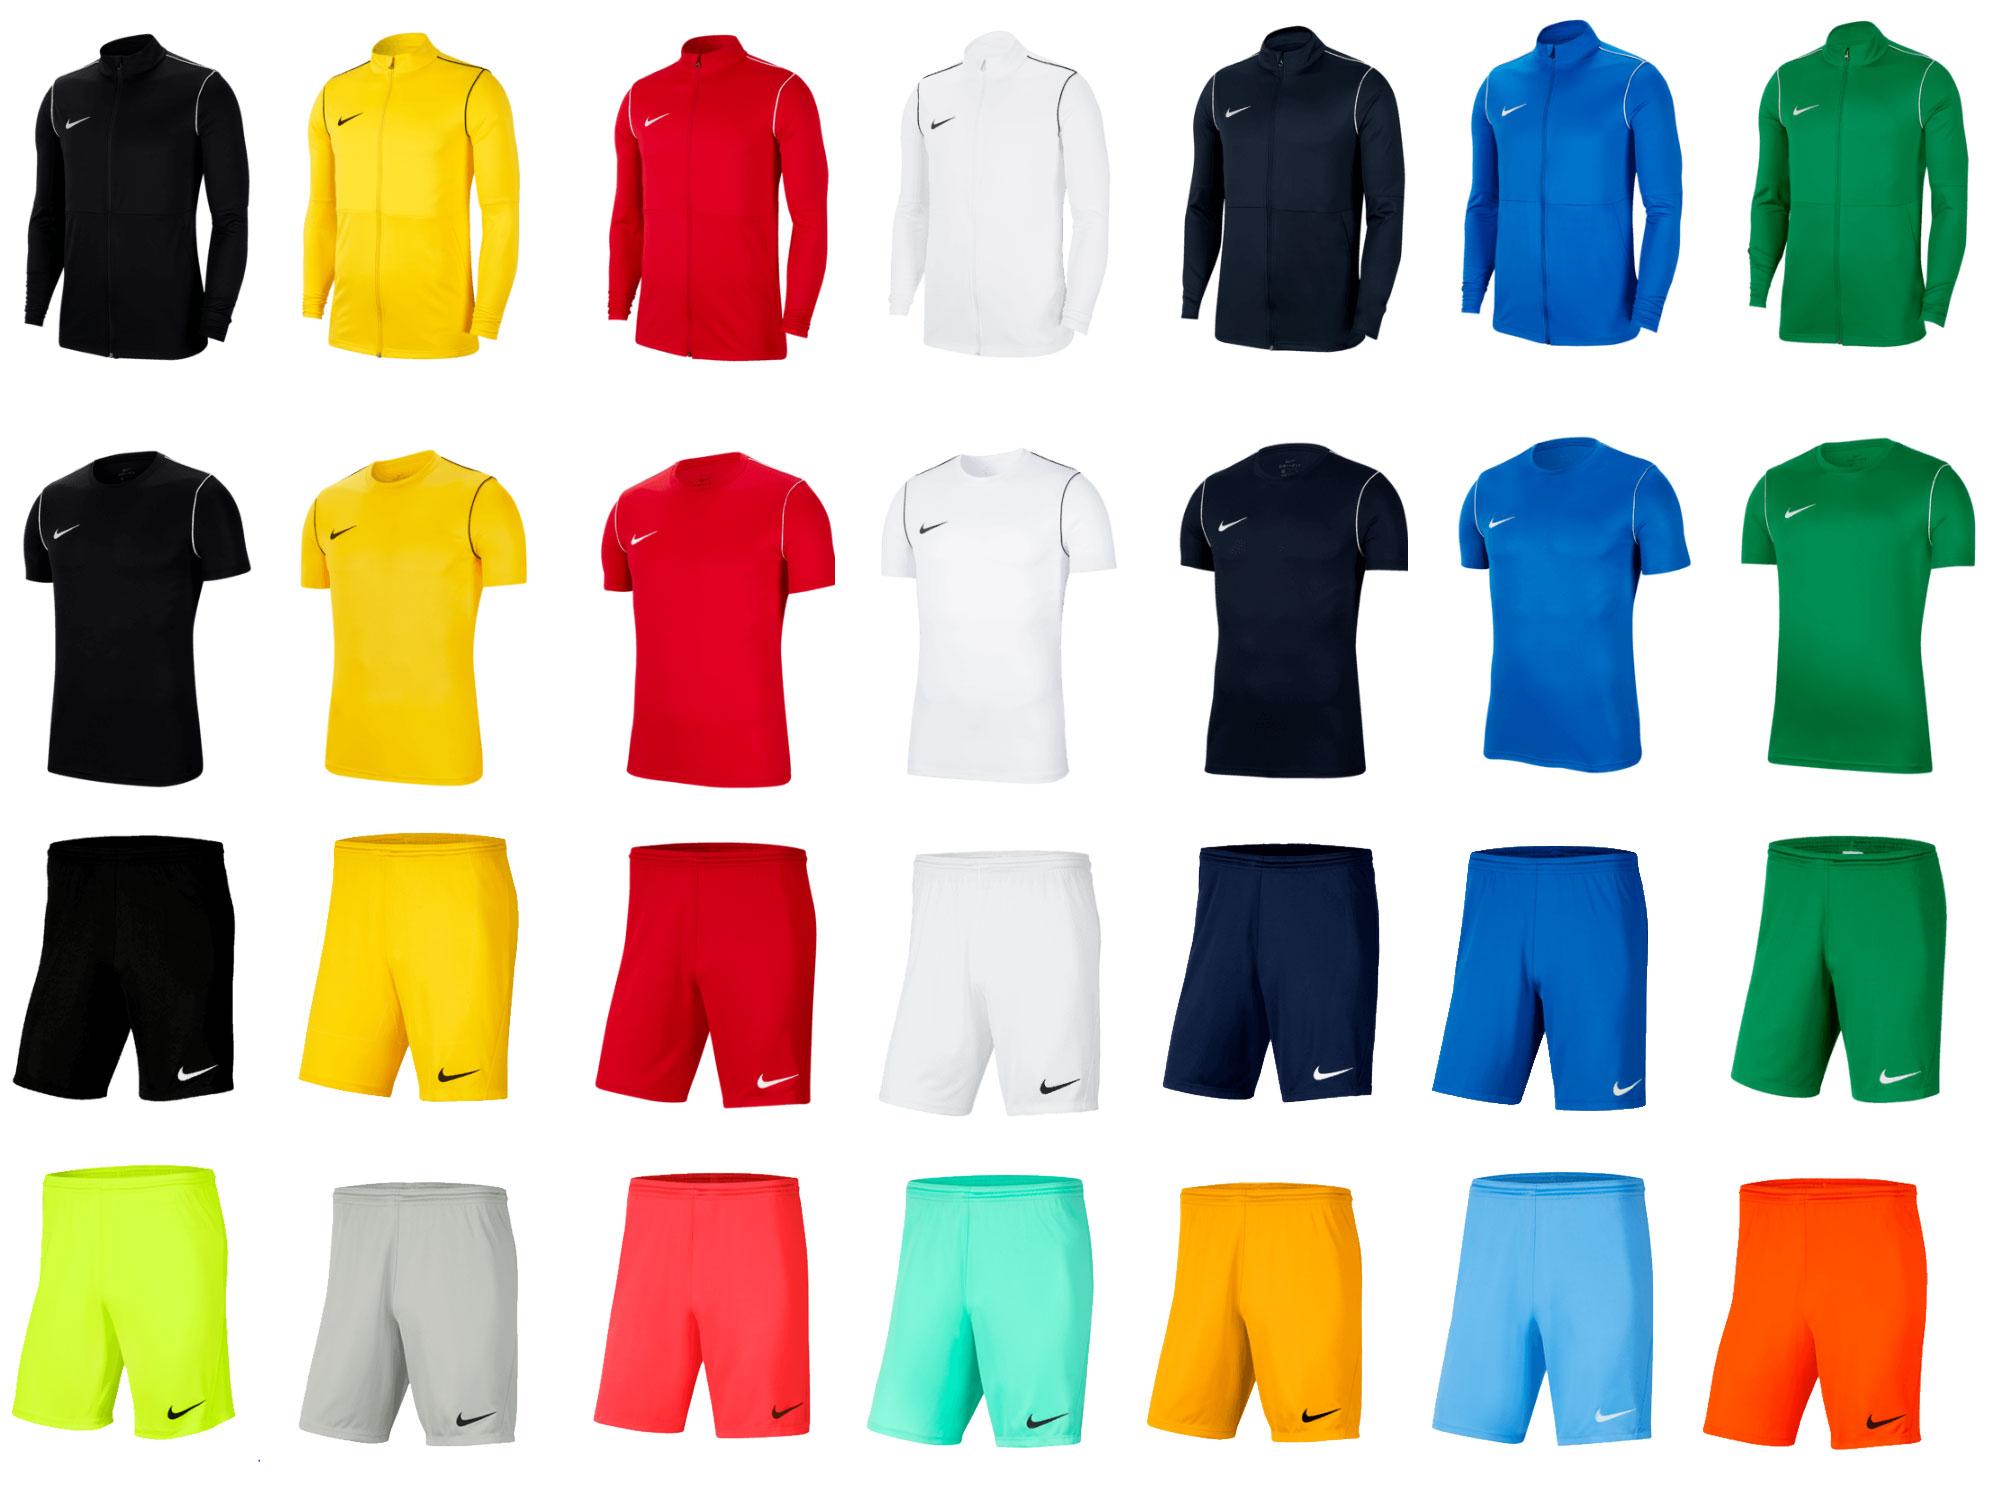 Nike Park 3-delige trainingsset - vele kleuren + maten @ Geomix